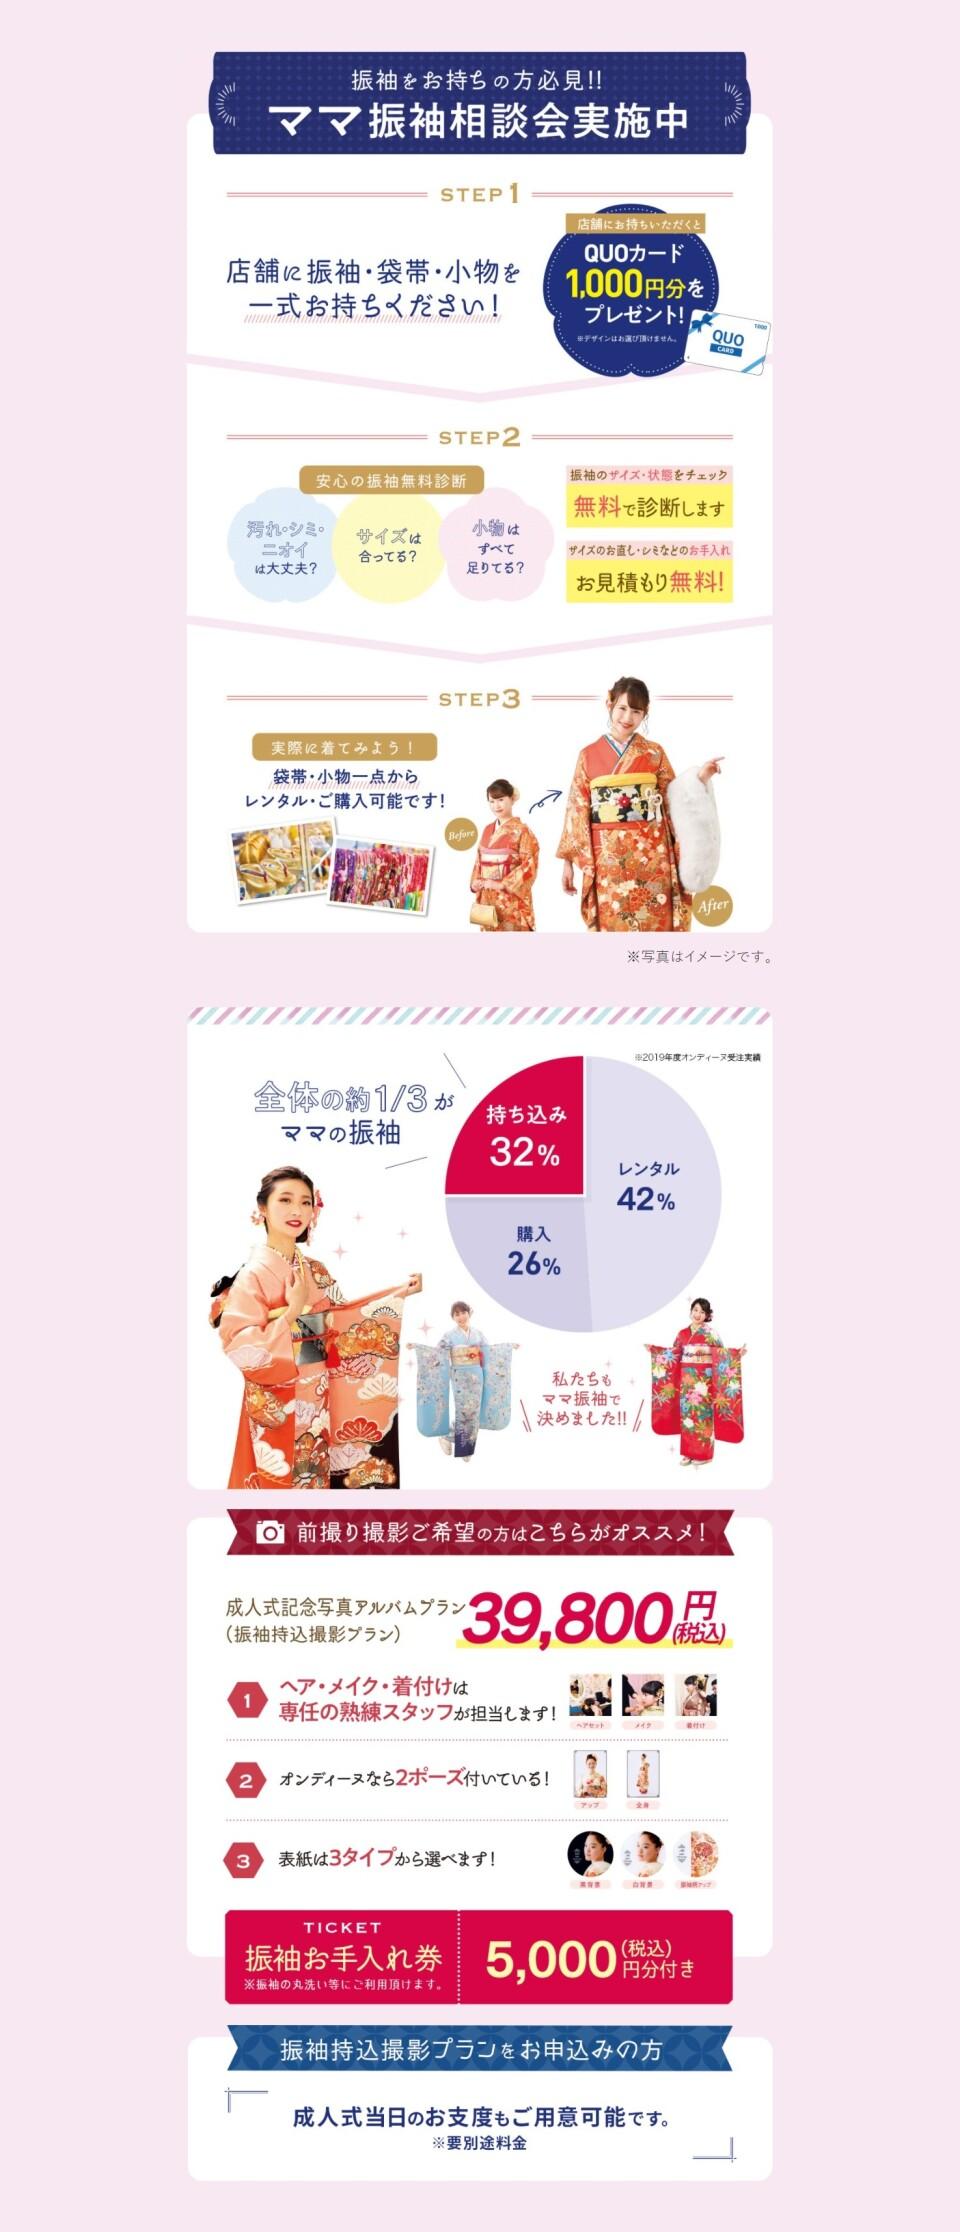 FireShot Capture 4772 - オンディーヌ各店周年祭|成人式の振袖レンタル・販売オンディーヌ - www.ondine.jp